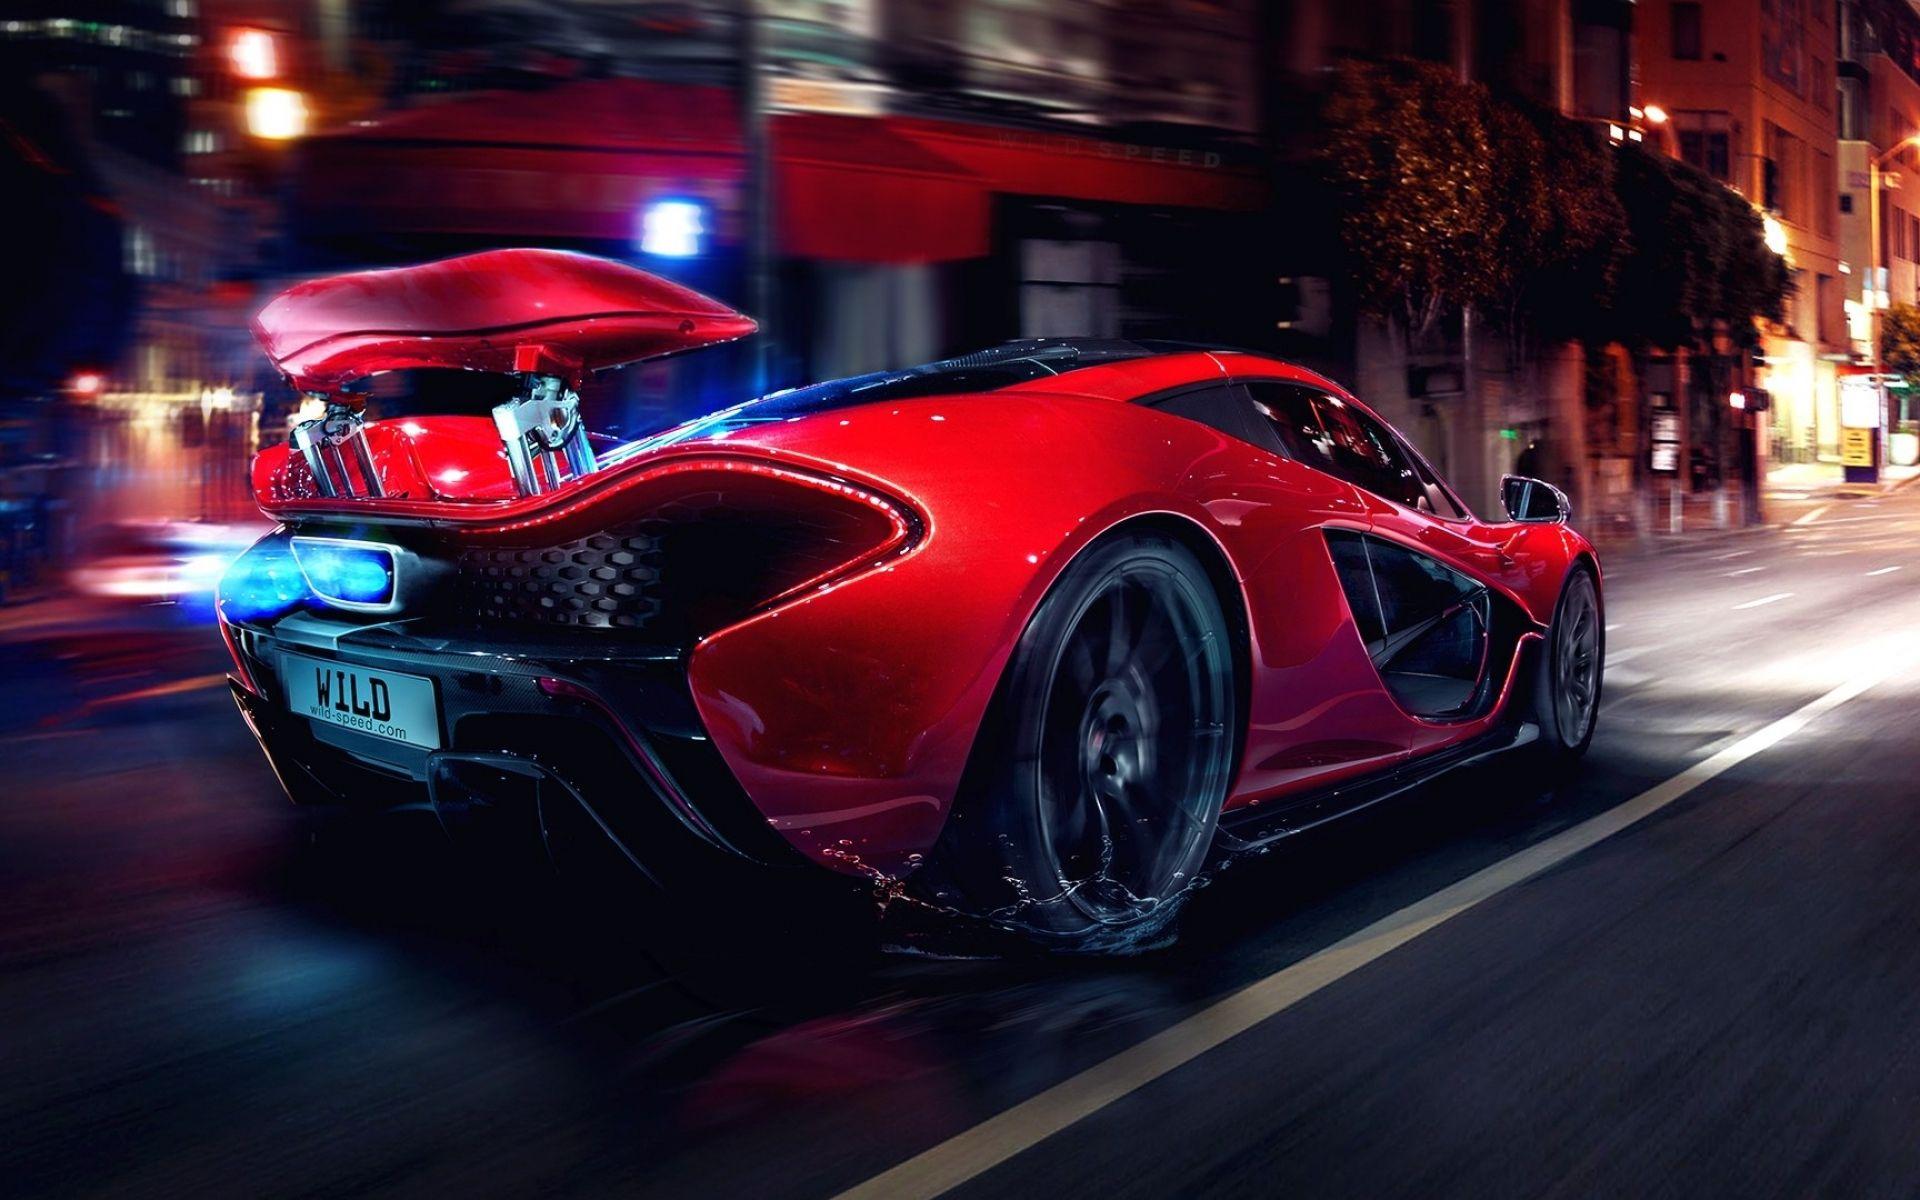 Red McLaren P1 City Night Street Racing Motion Wallpaper